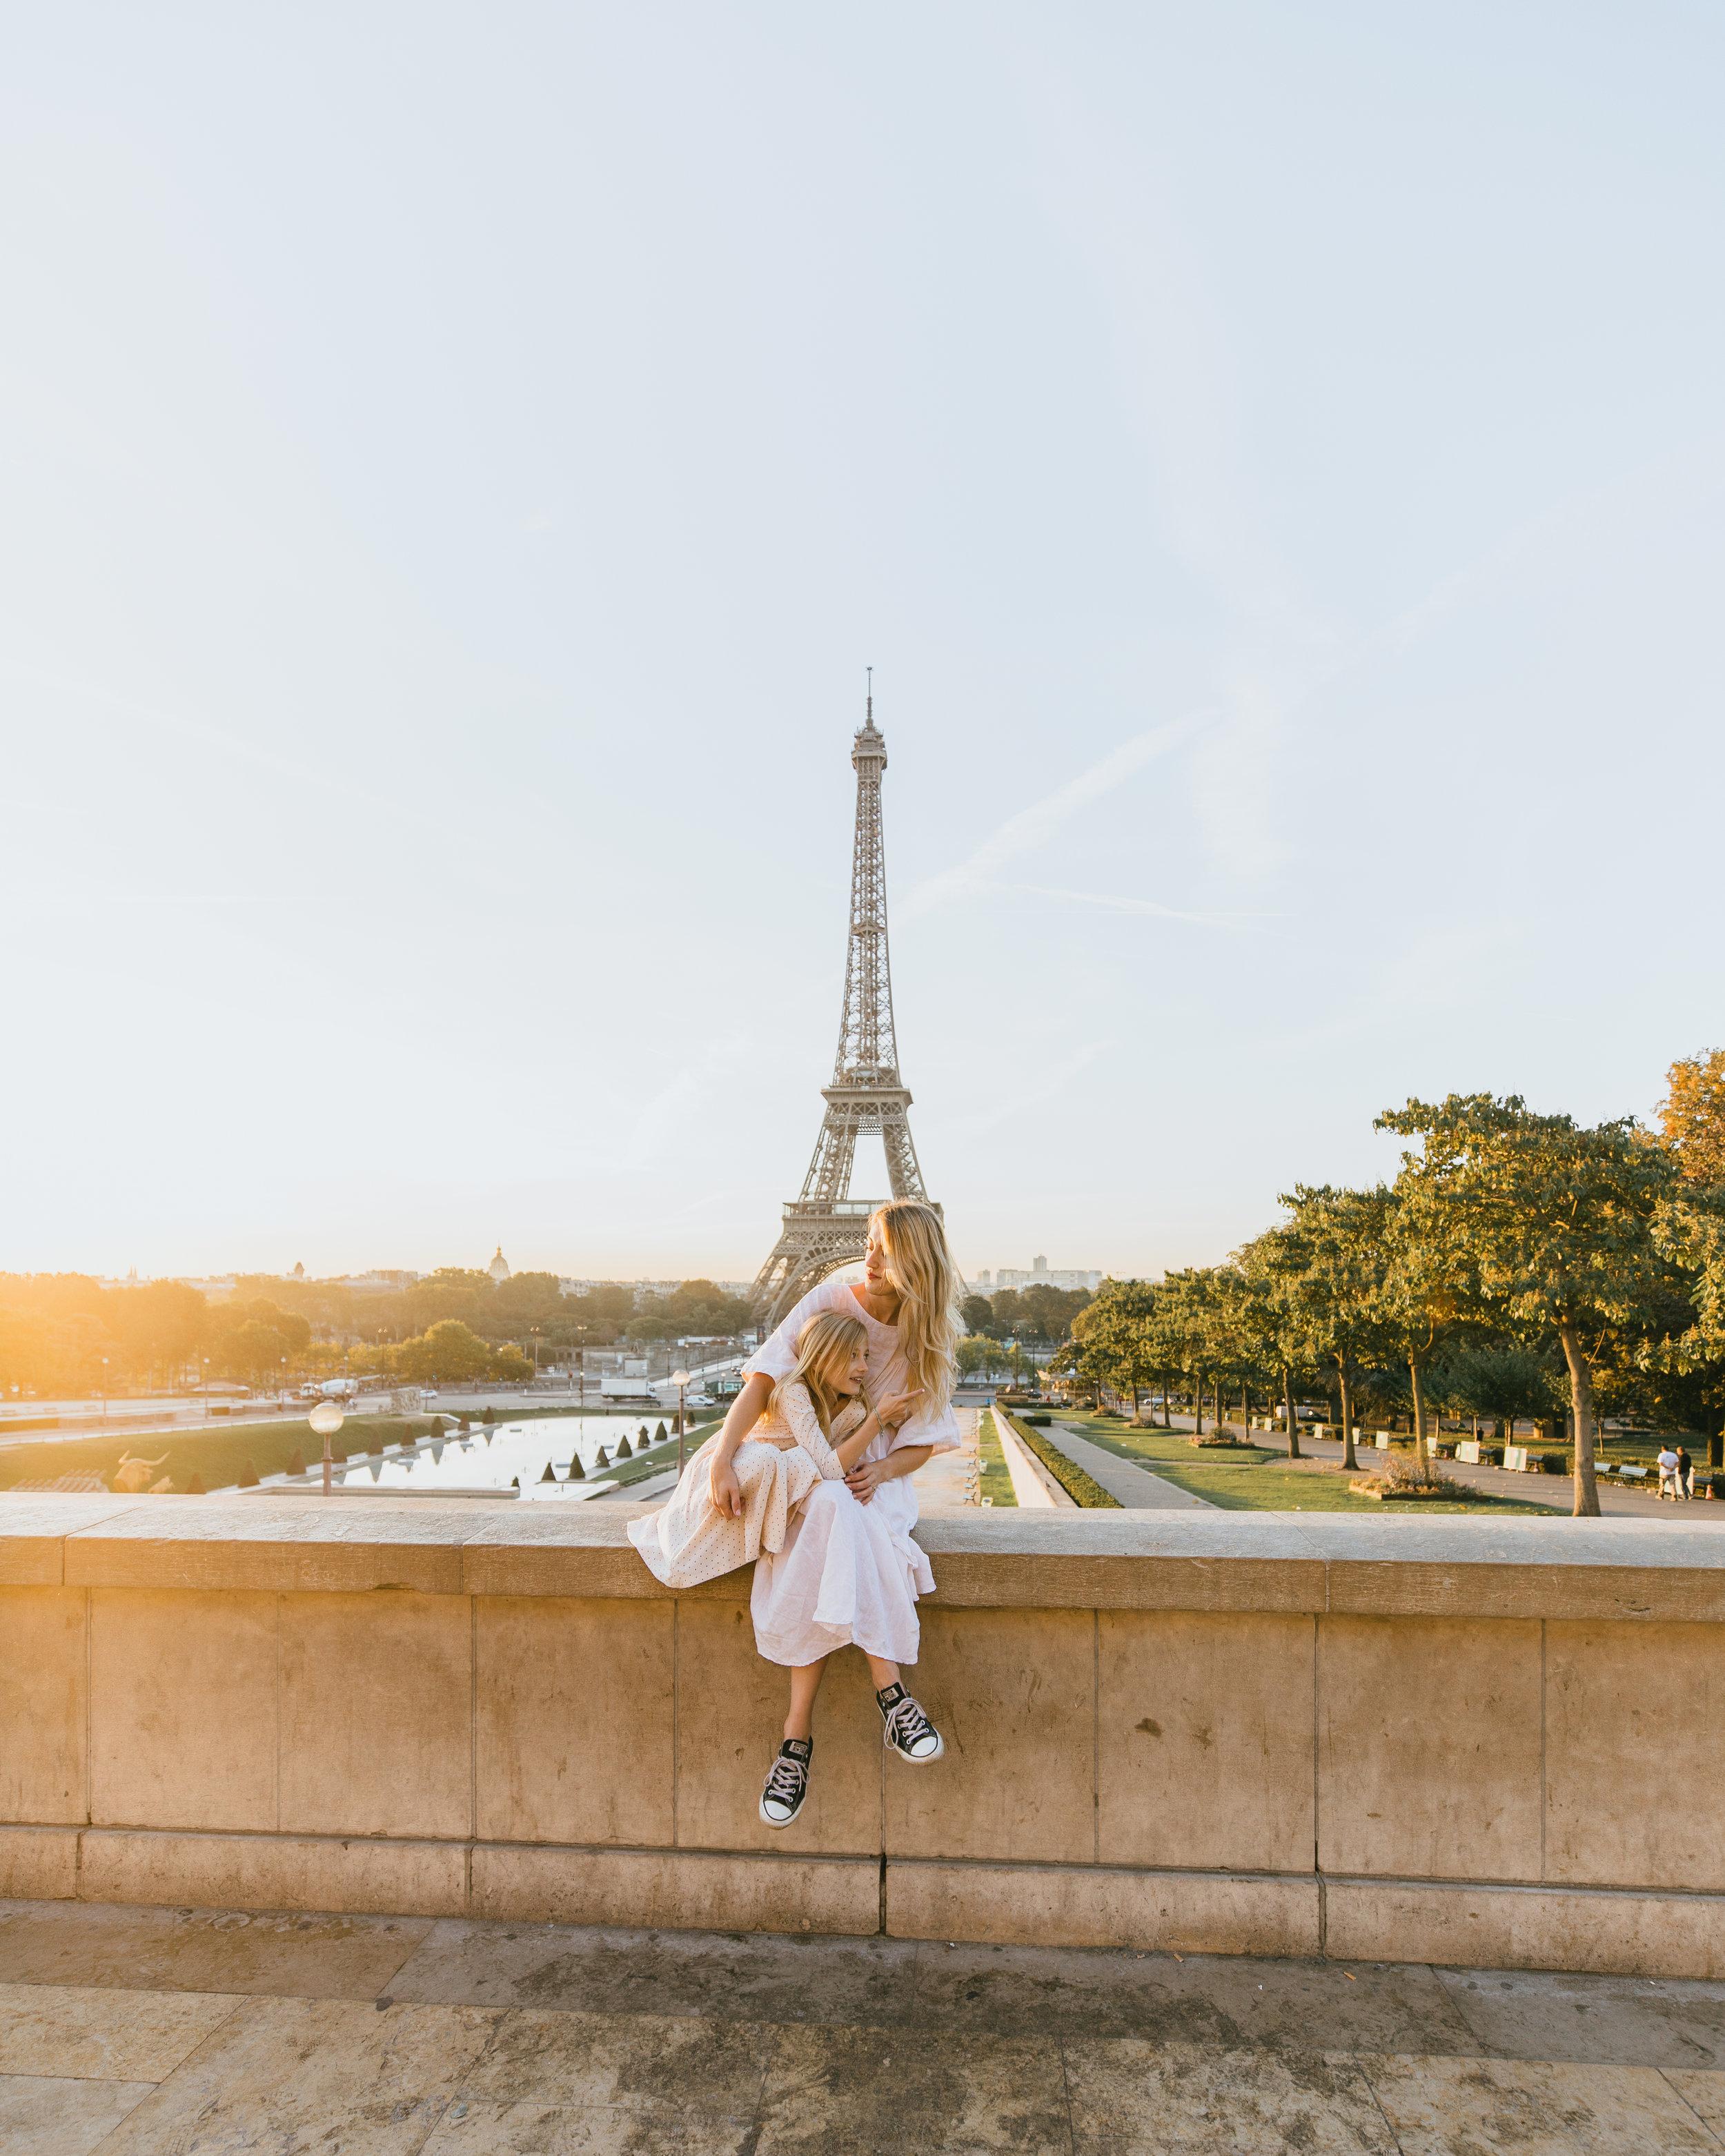 paris family photography session